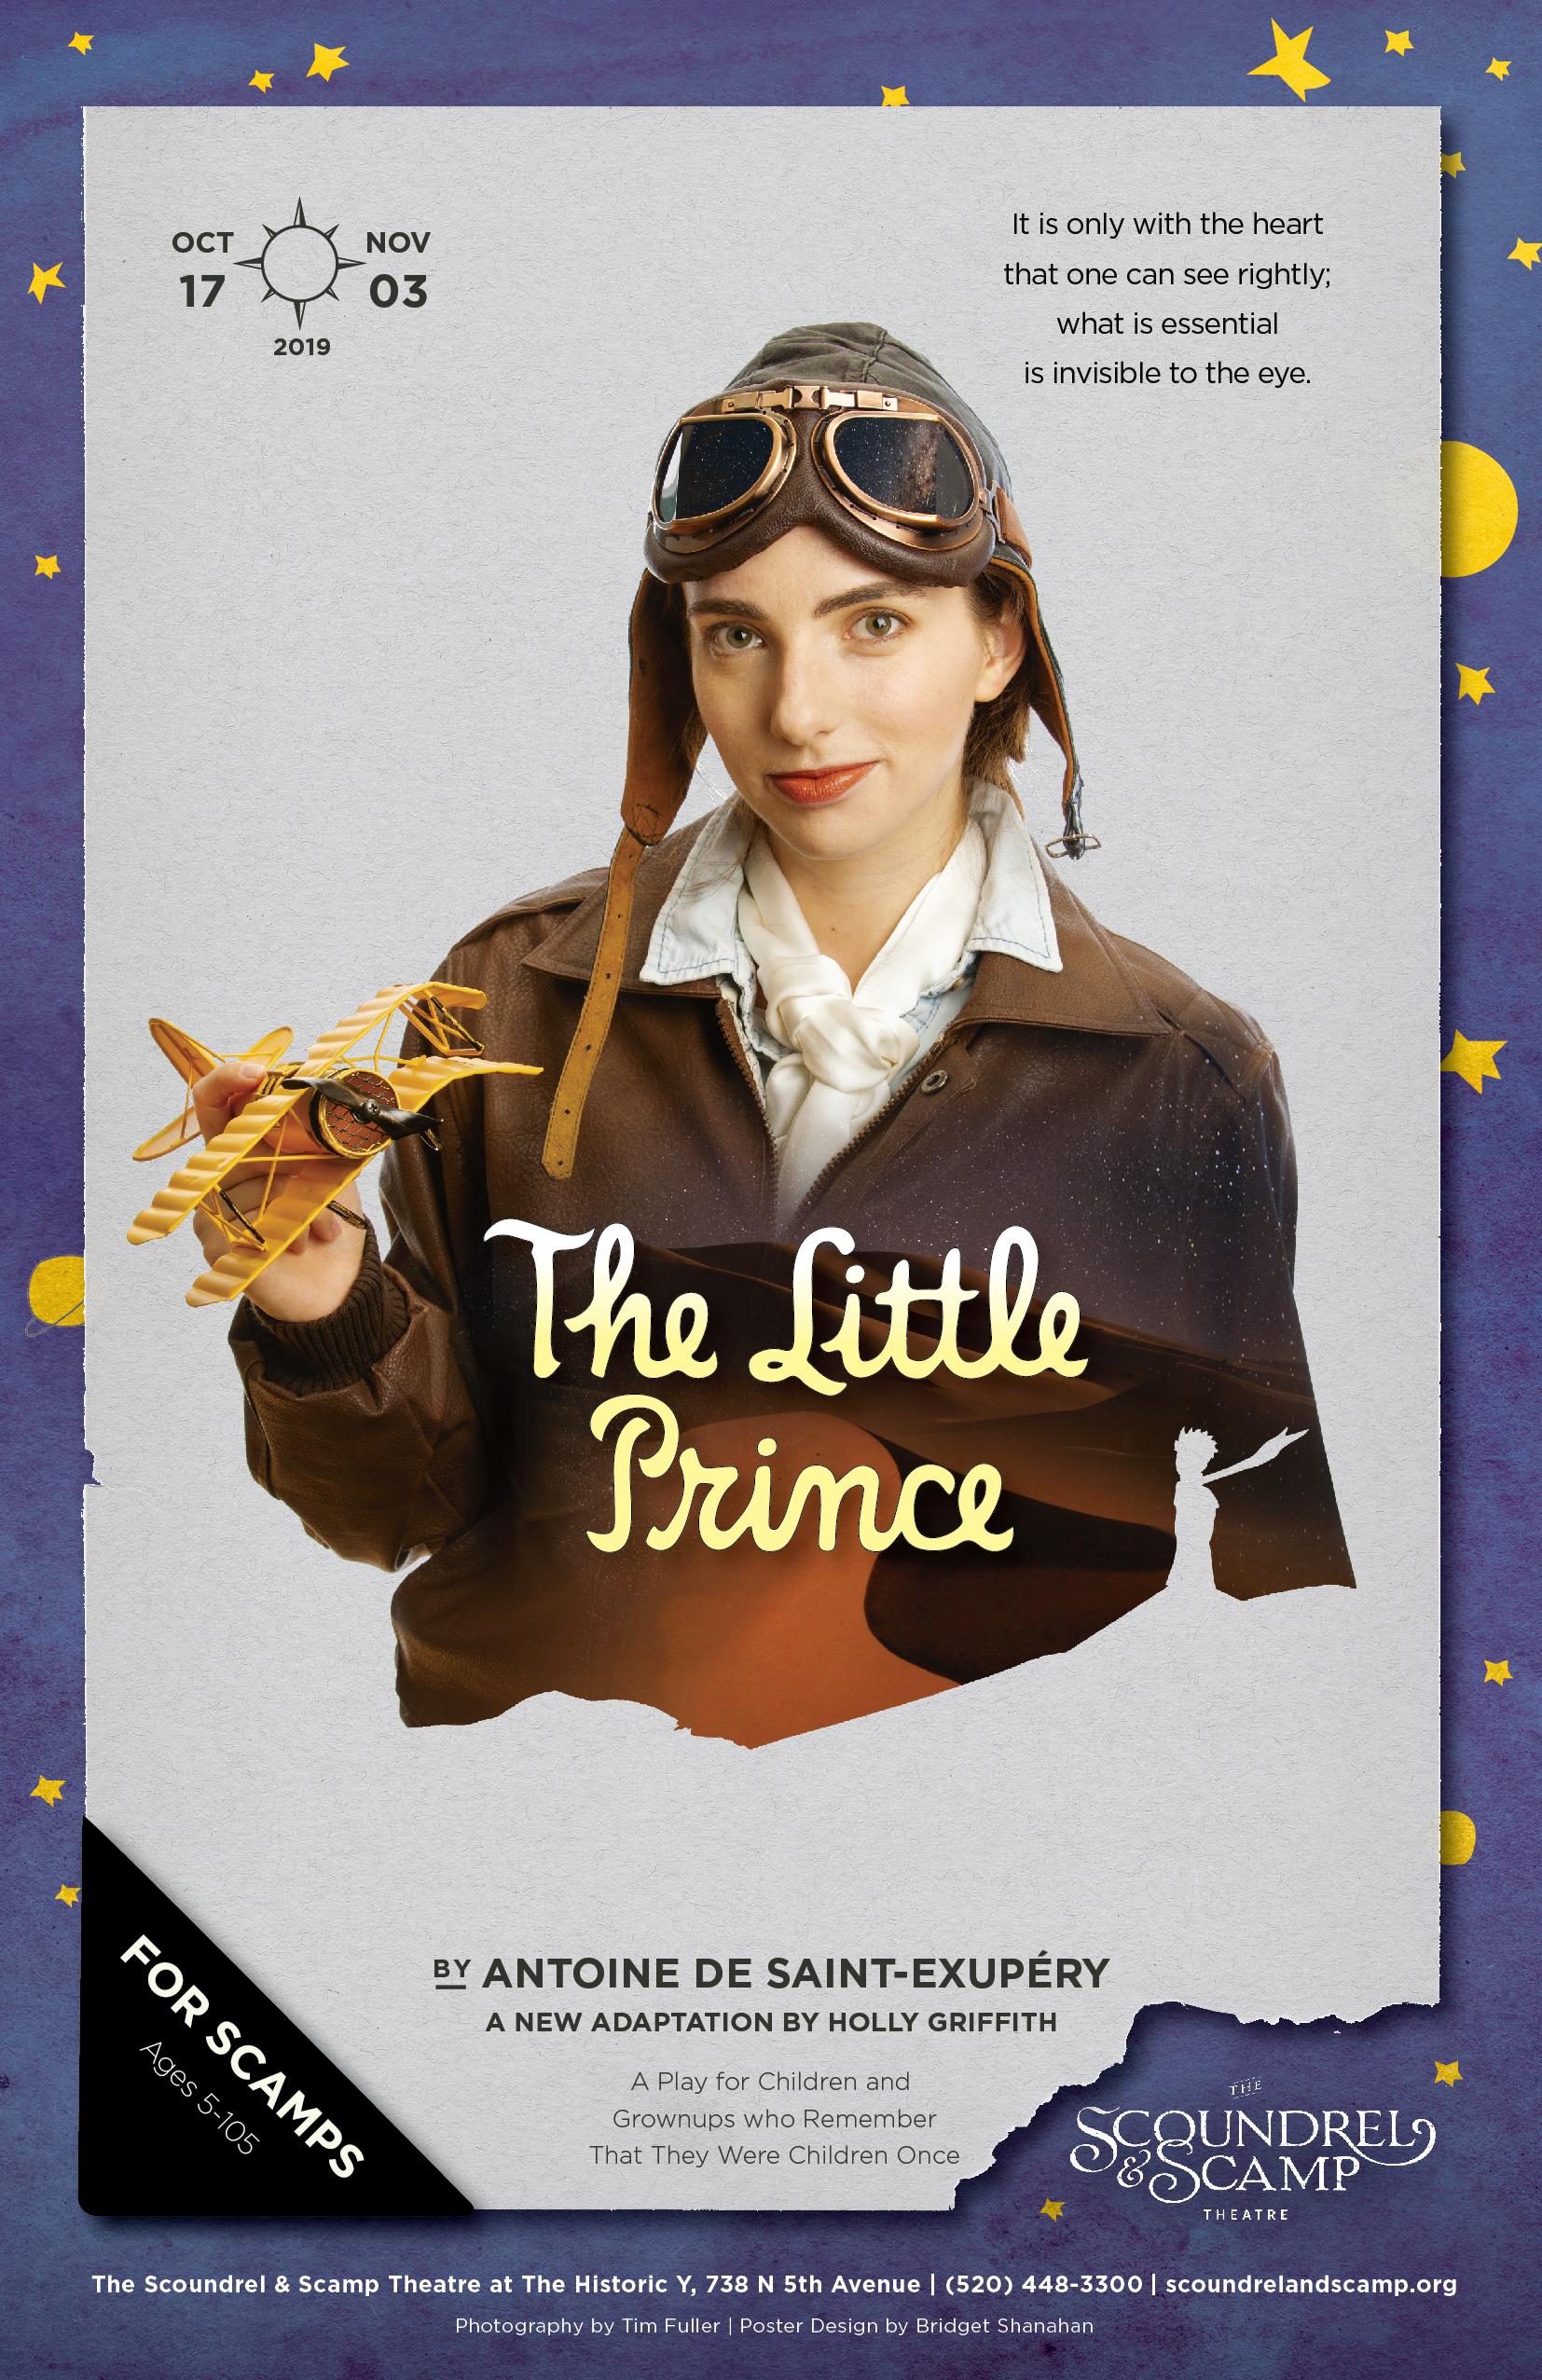 THE LITTLE PRINCE-11x17 web-01.jpg